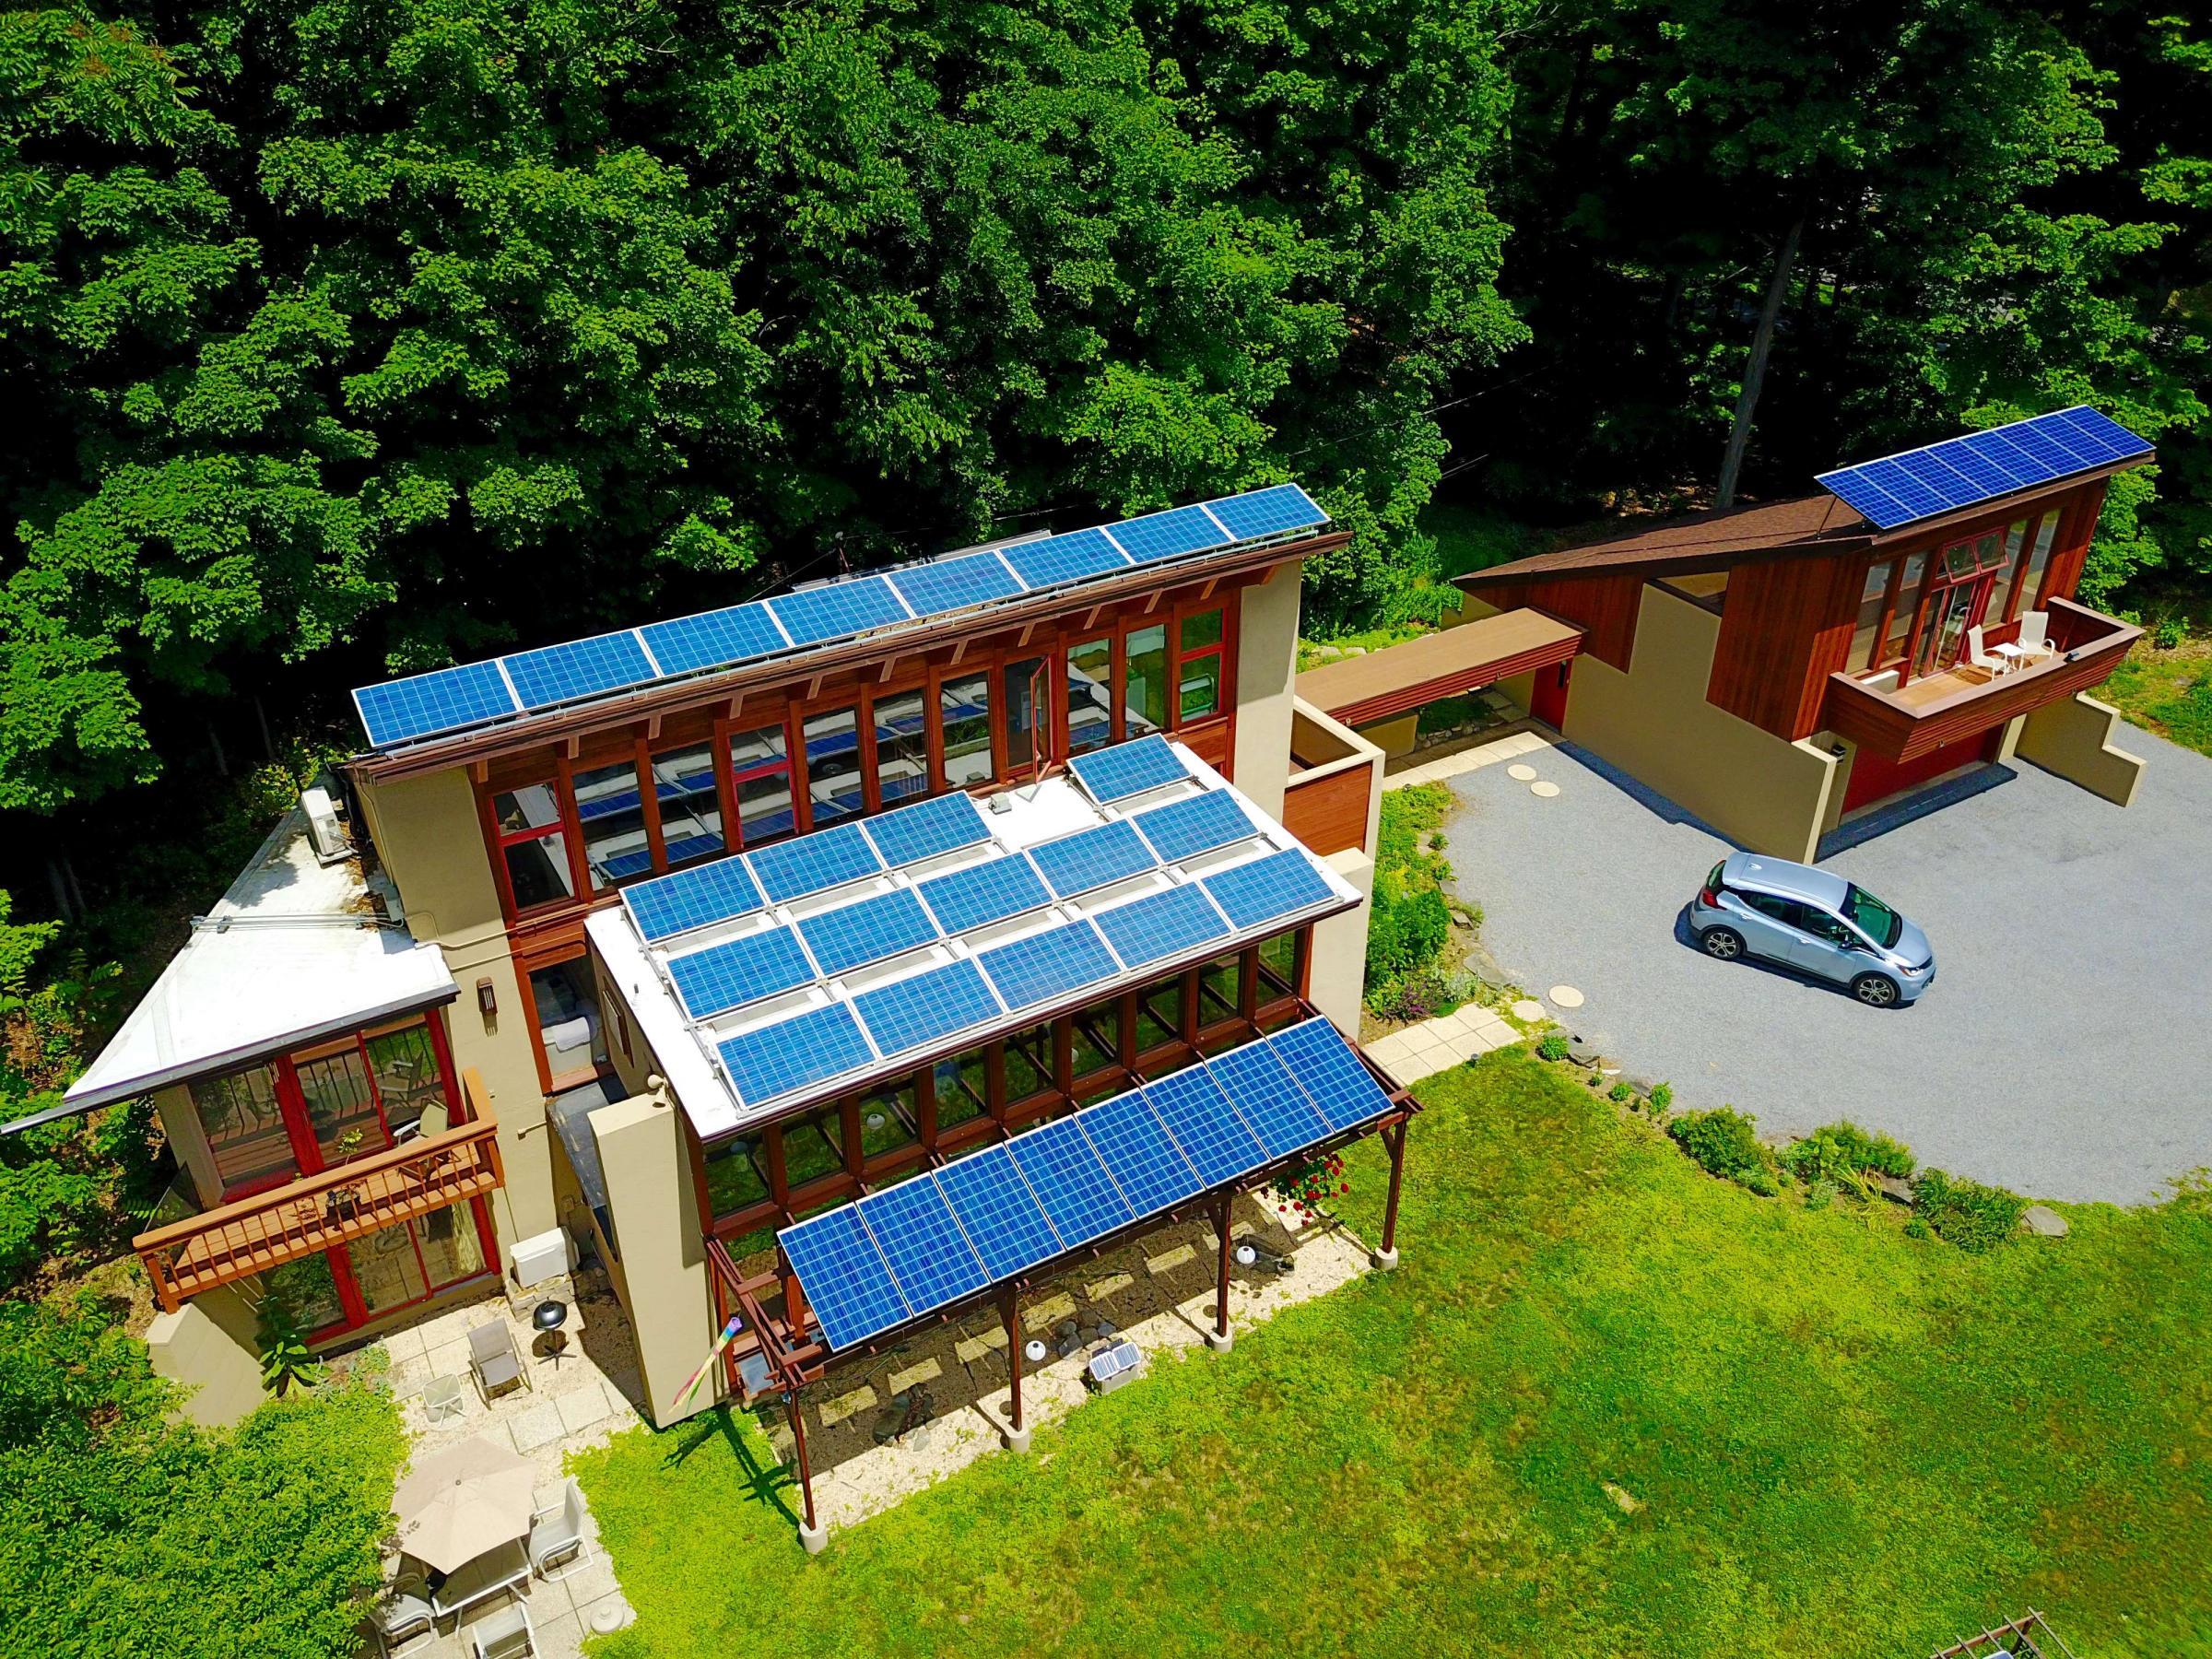 Helios passive active solar home net zero energy nesea for Active solar house plans